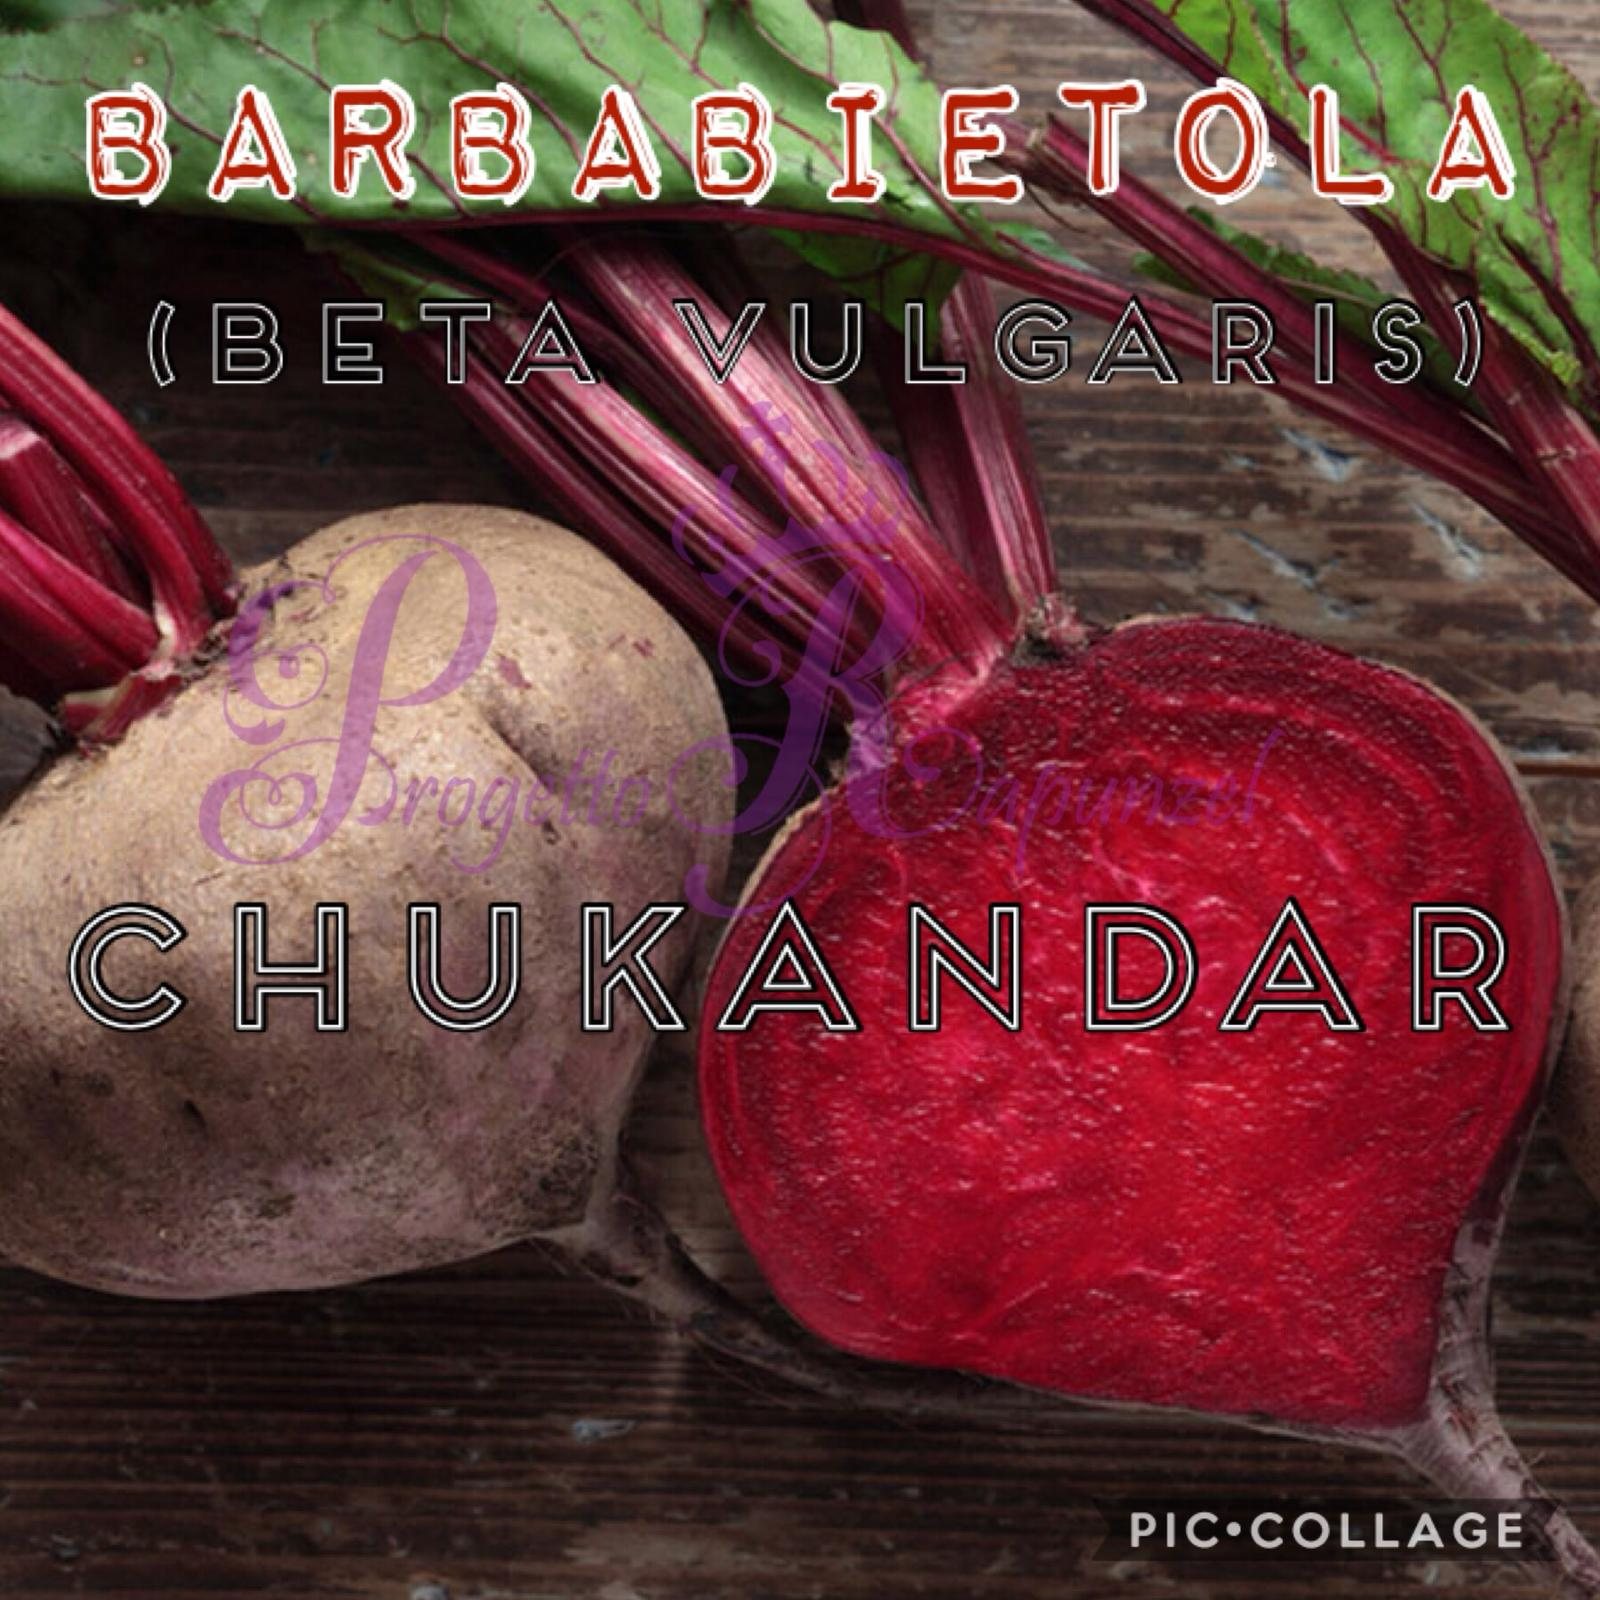 BARBABIETOLA – BETA VULGARIS – CHUKANDAR